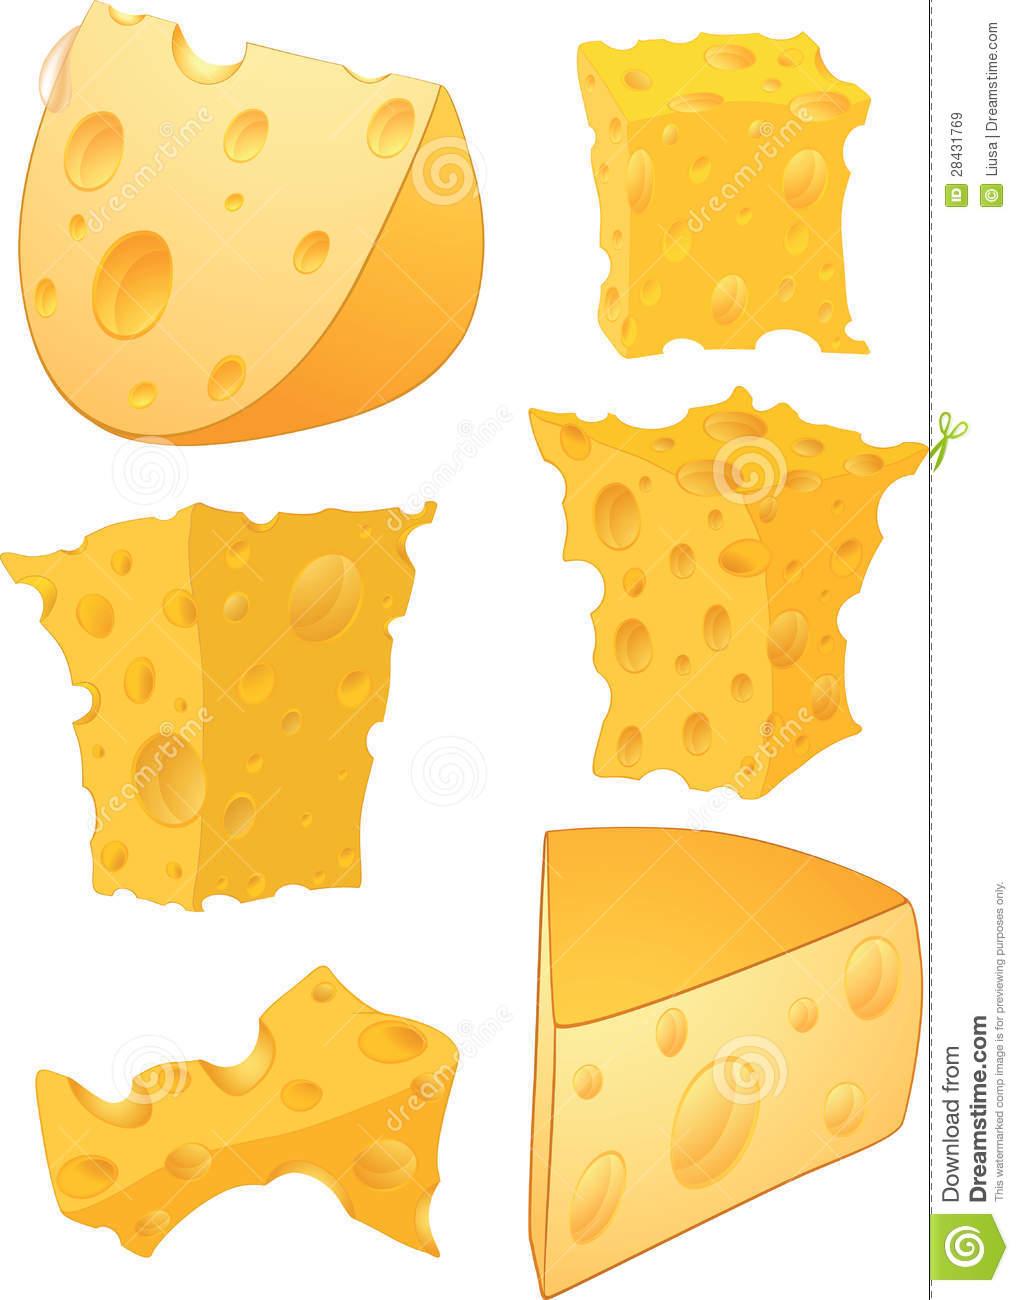 Cheese clipart chese. Clip art panda free